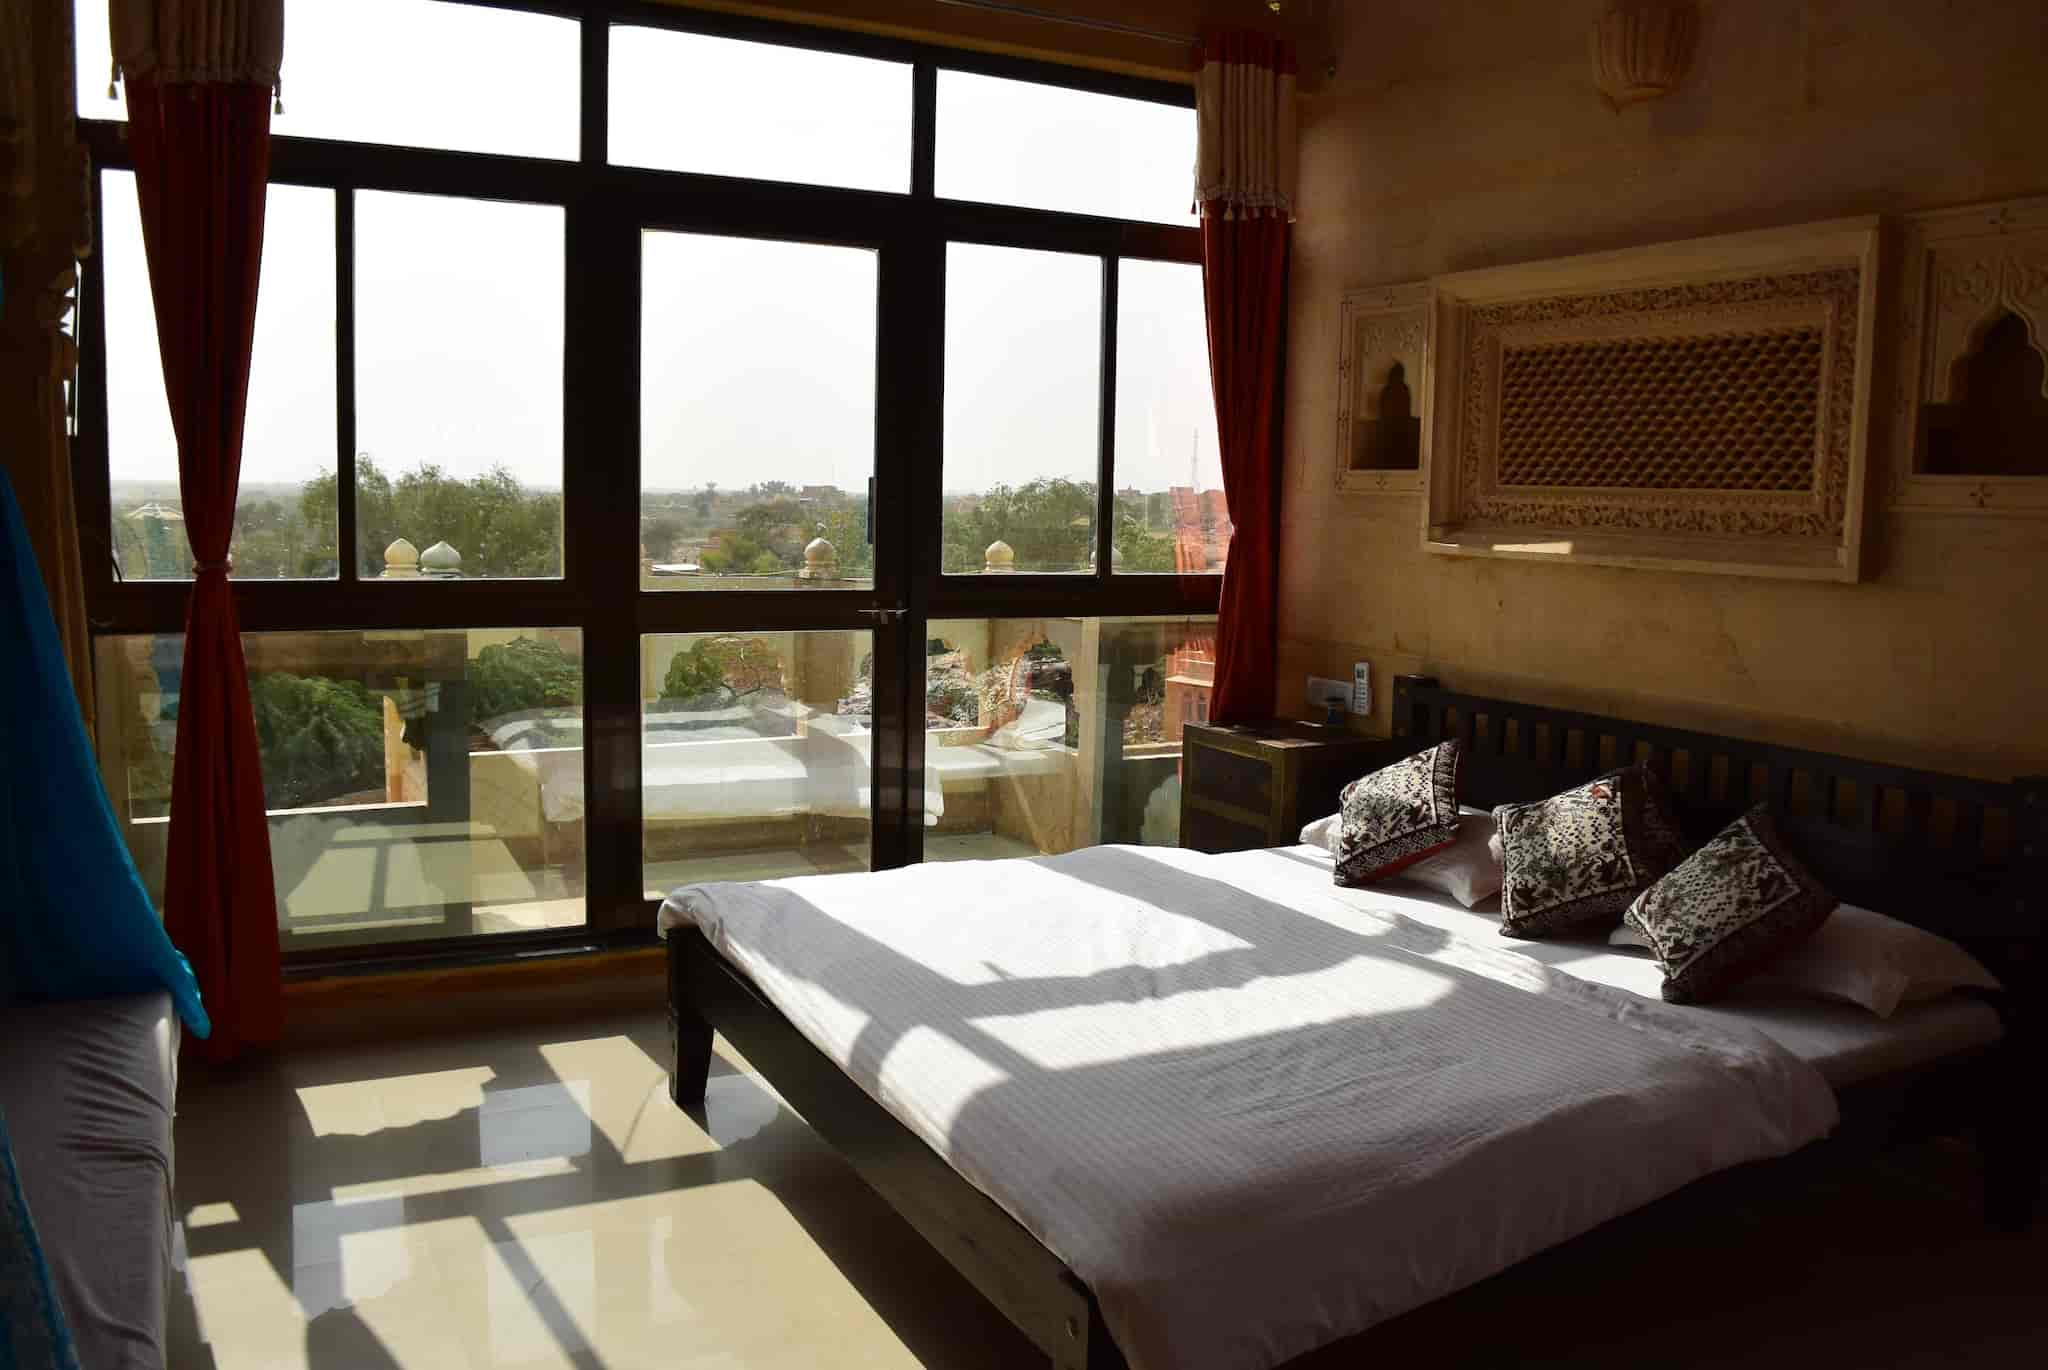 Deluxe Room Hotel Tokyo Palace Photos Jaisalmer 3 Star Hotels